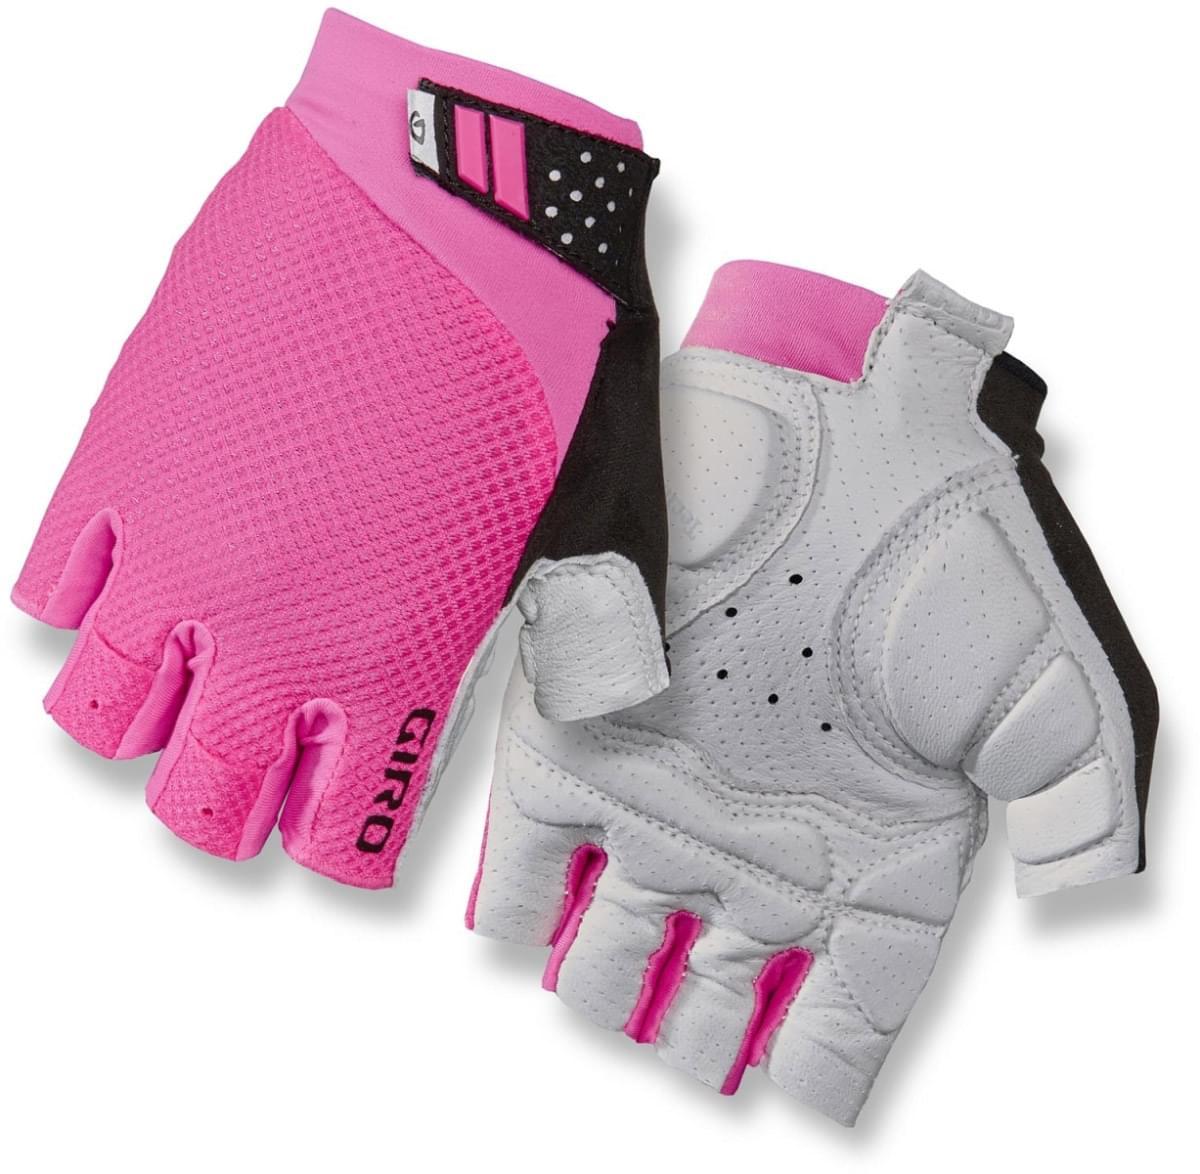 971bb5ecd Dámské cyklistické rukavice Giro Monica II Bright Pink - Ski a Bike ...